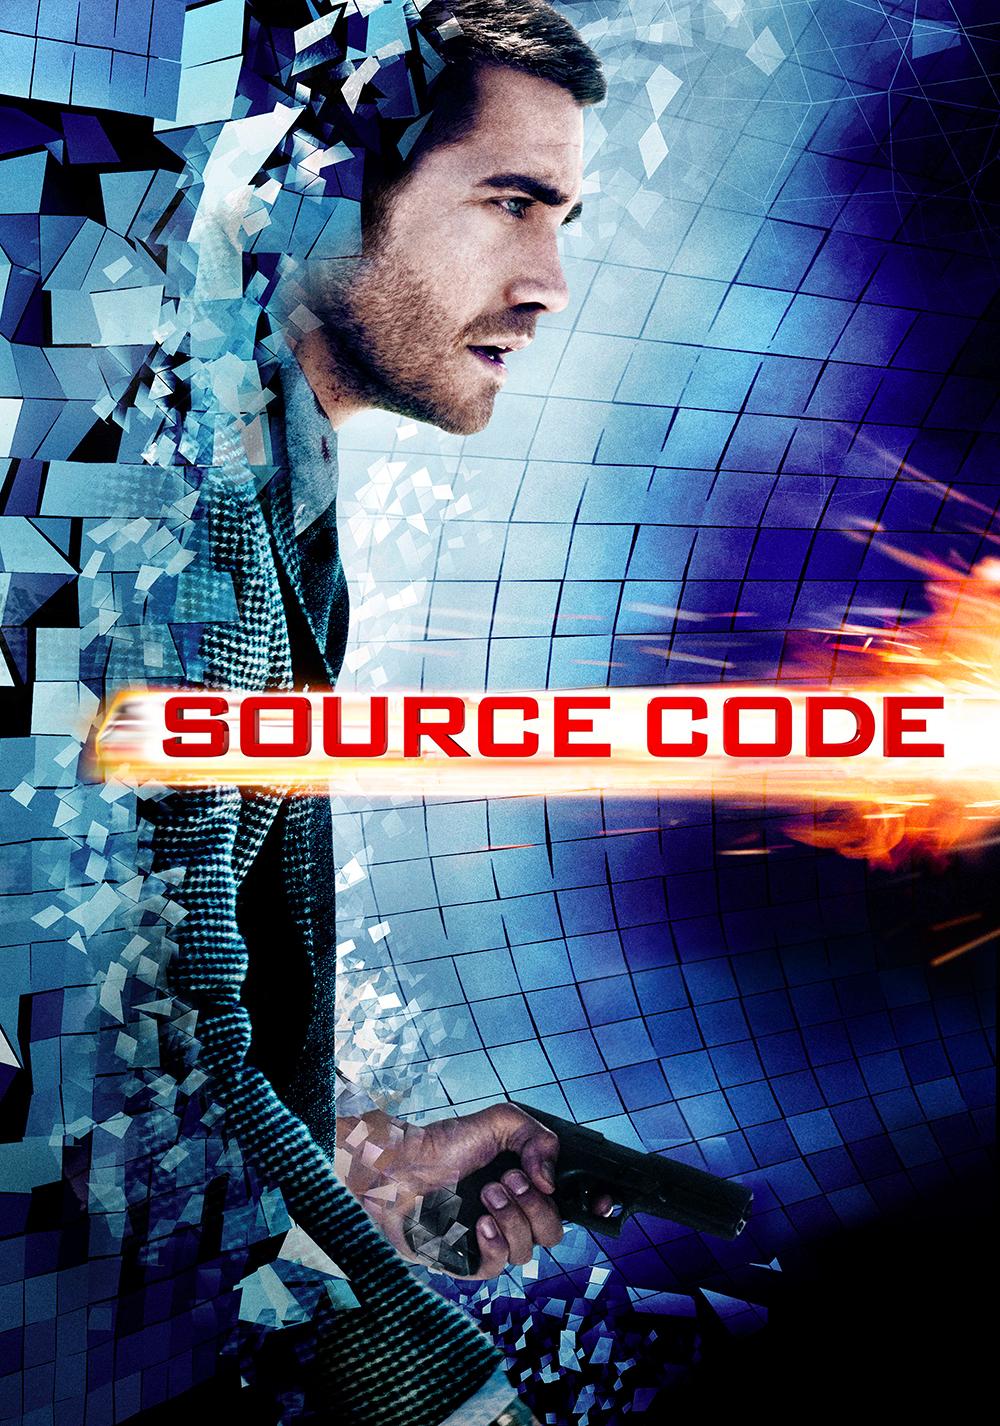 Source Code Film